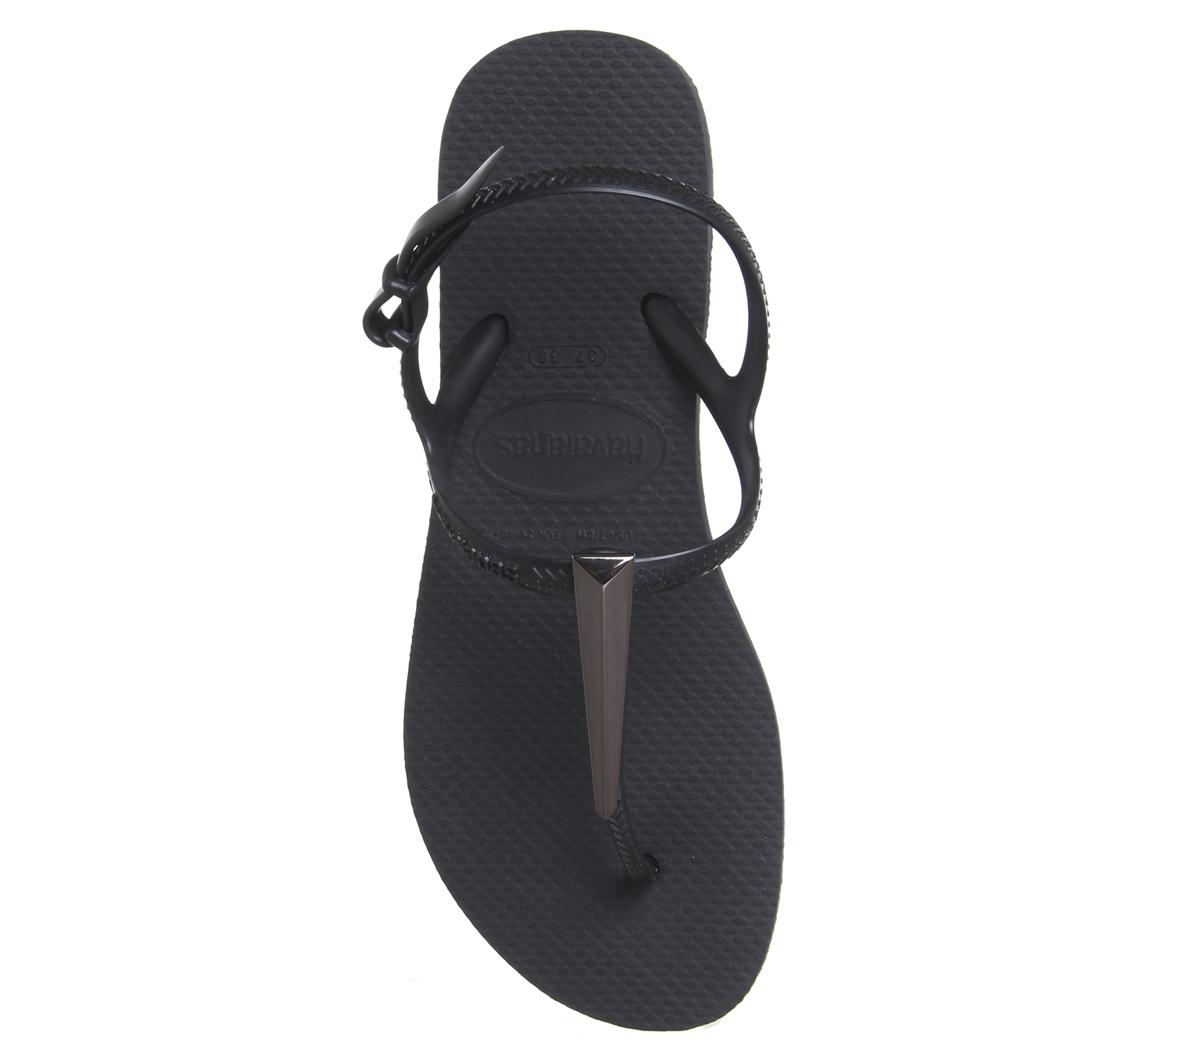 df5958b7a8f Womens-Havaianas-Freedom-Sl-Maxi-Black-Sandals thumbnail 6